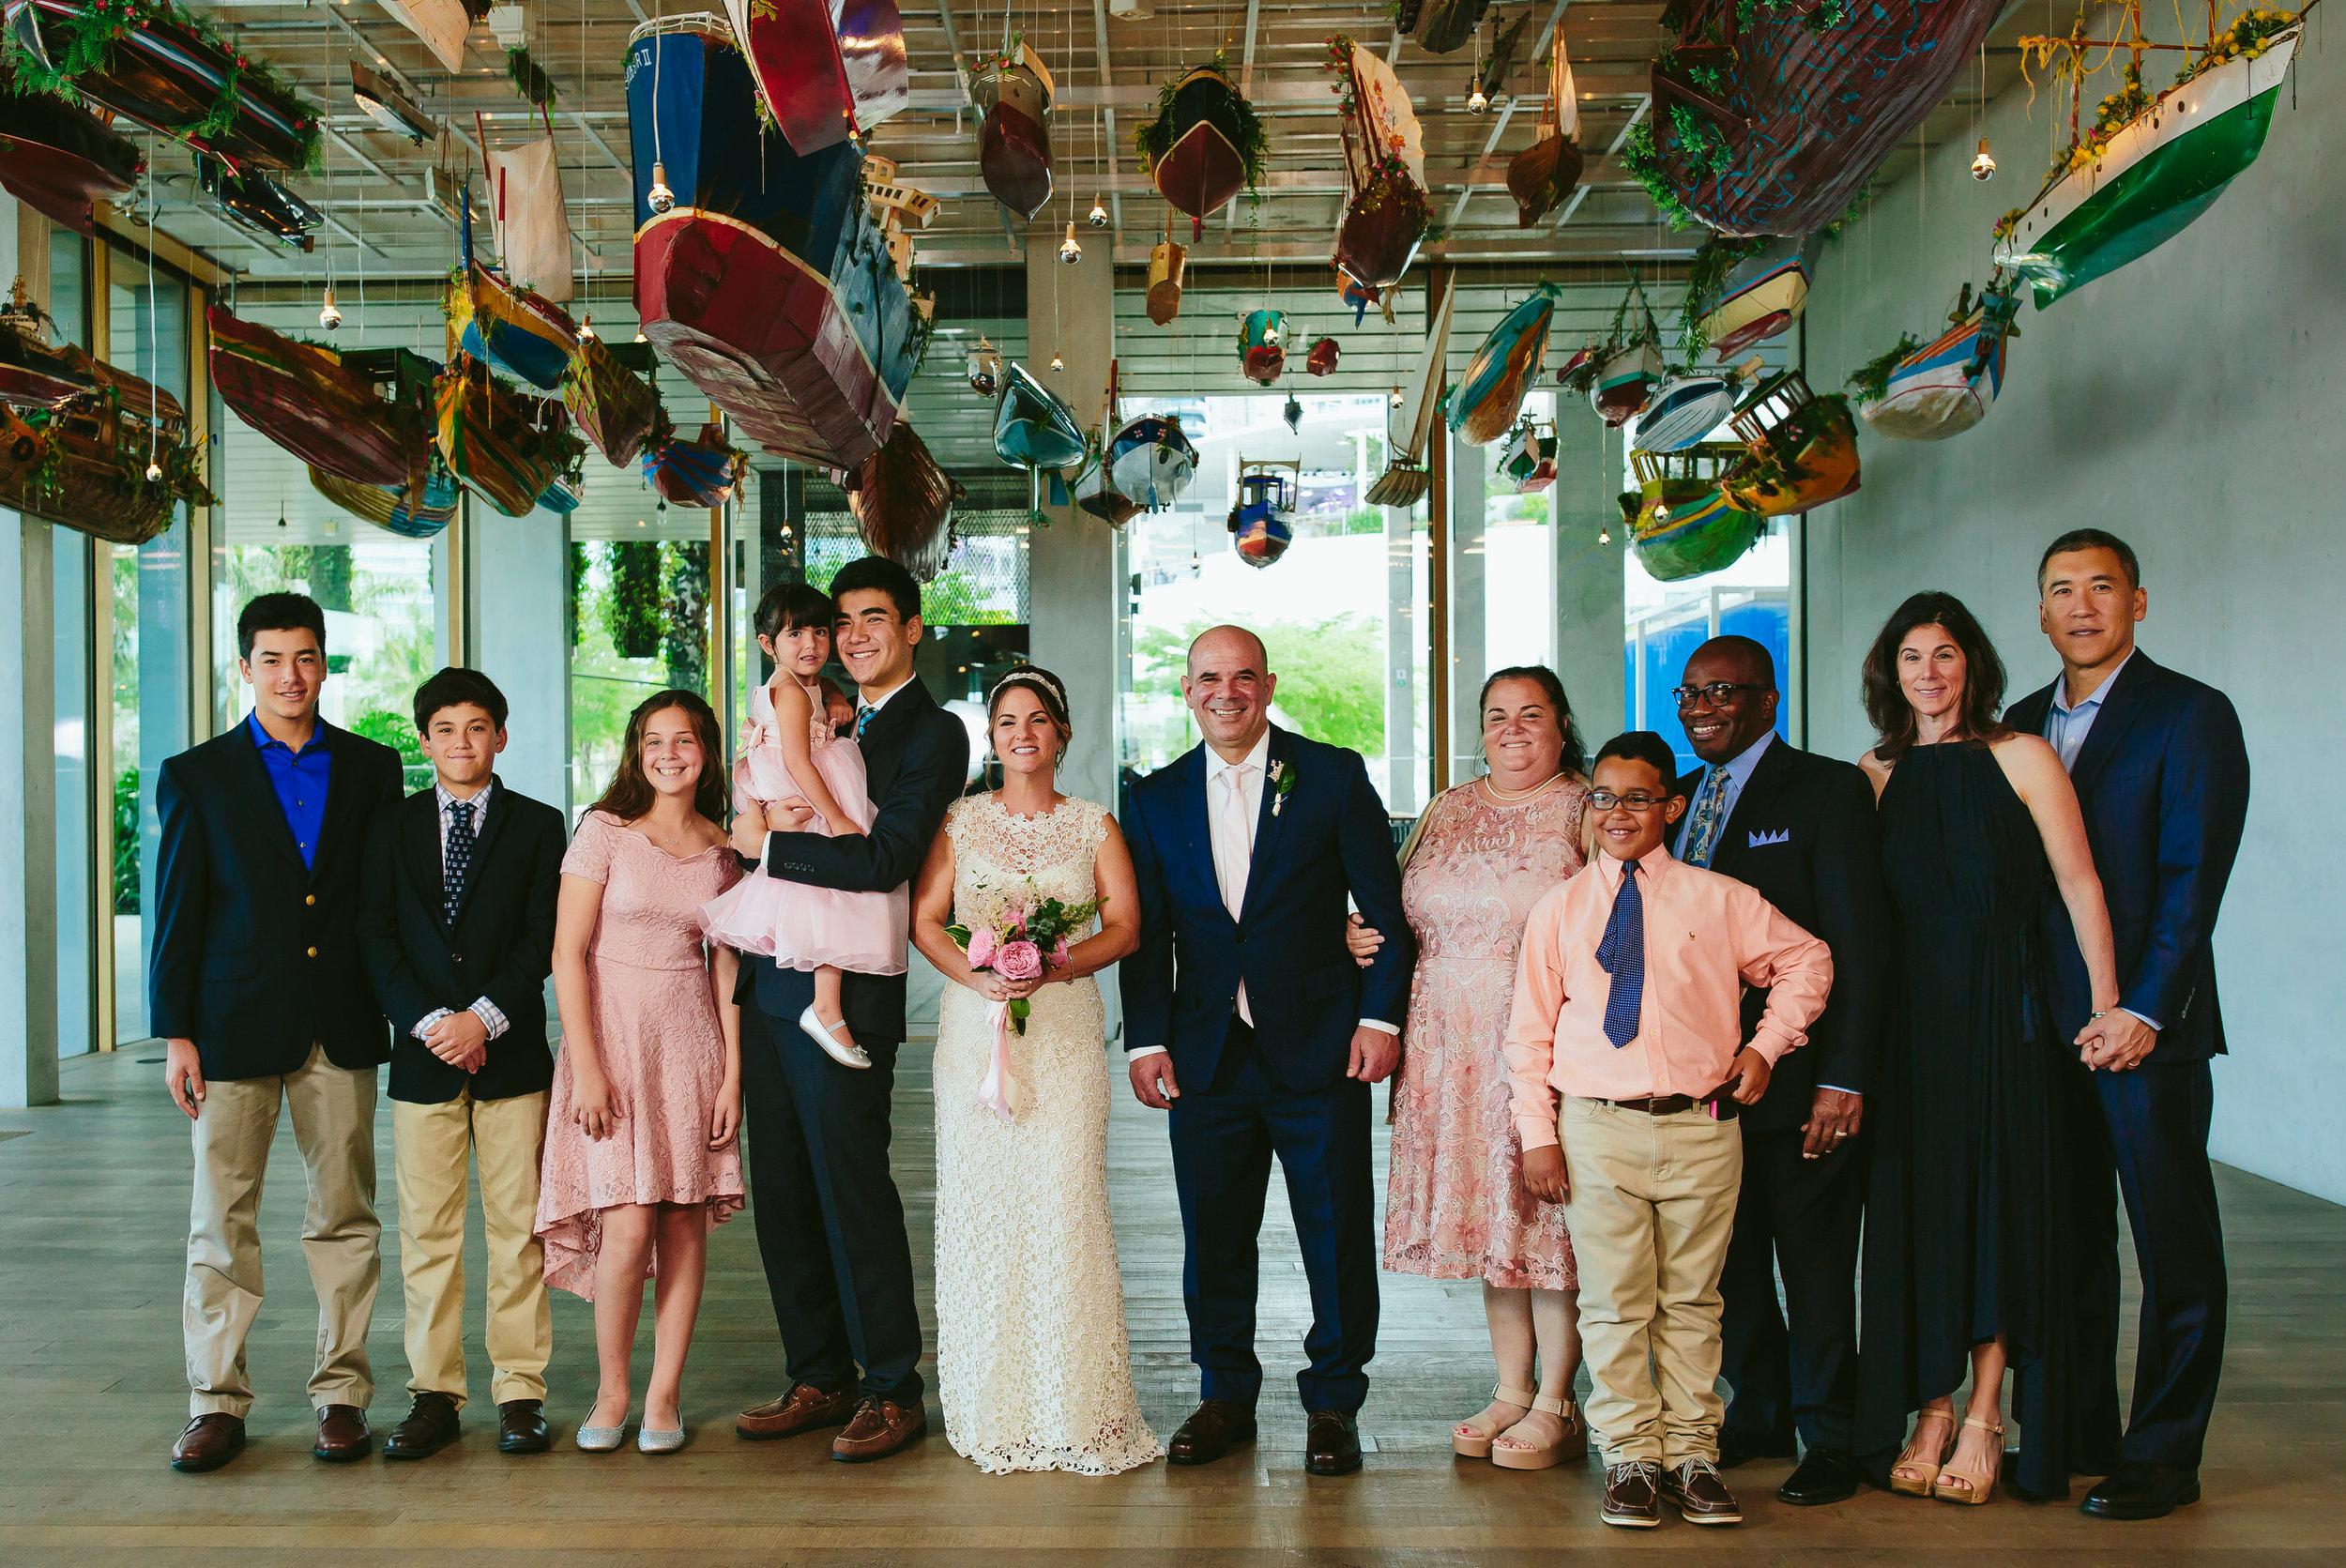 perez_art_museum_wedding_steph_lynn_photo_miami_photographer_family_formals-36.jpg